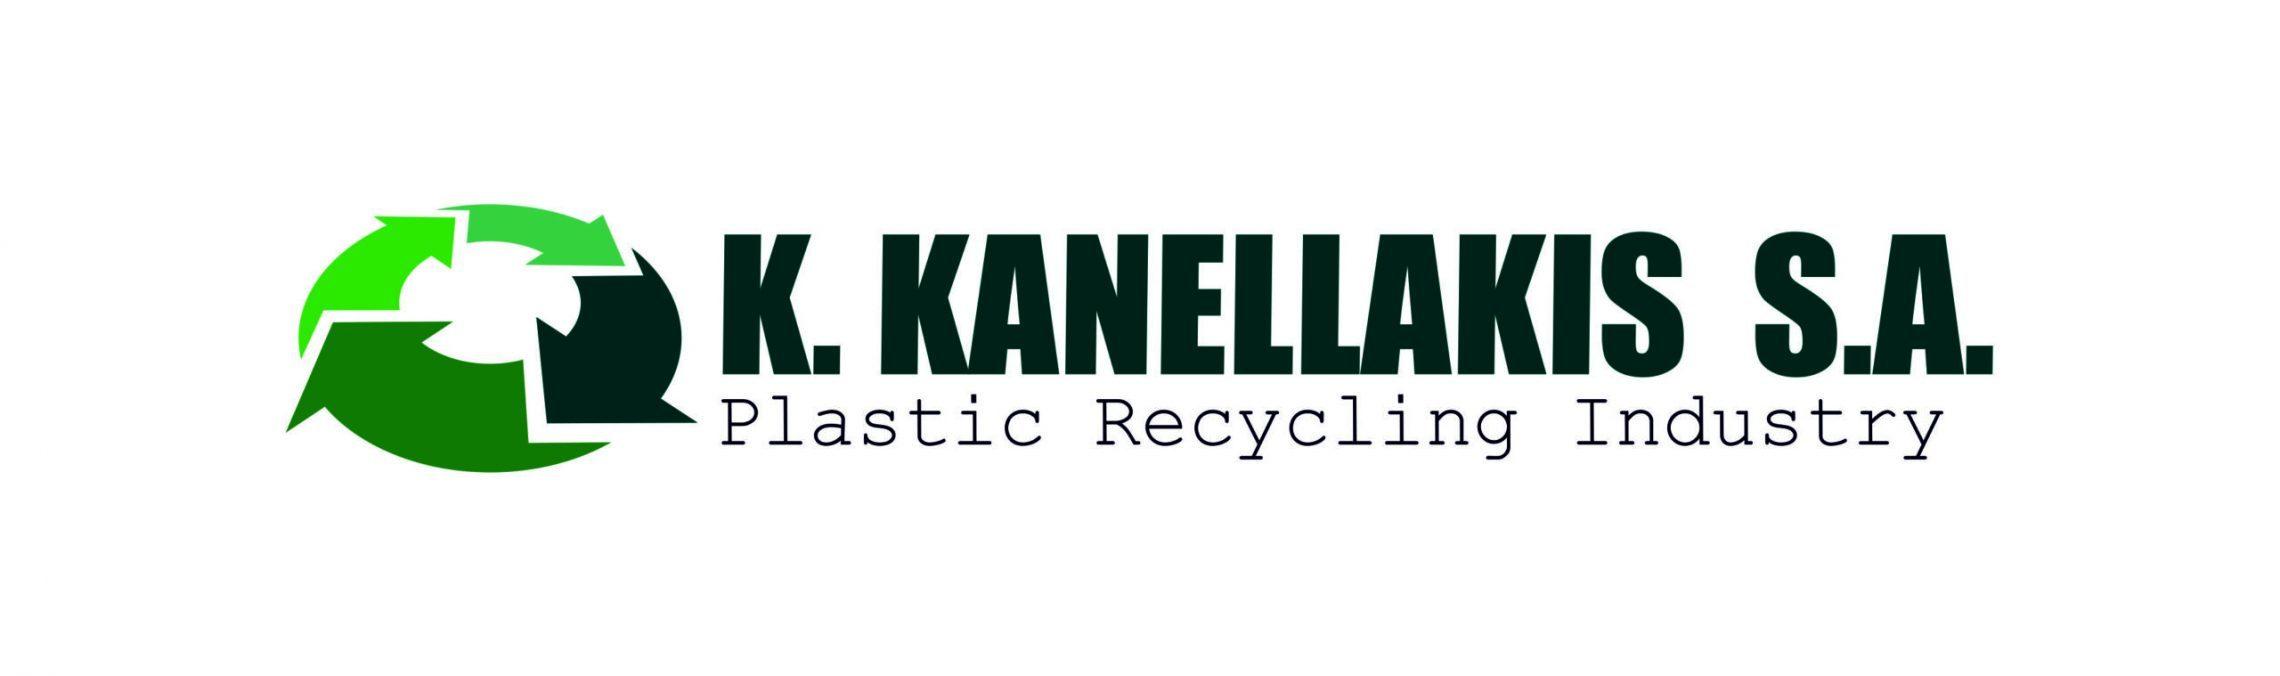 https://europeanplasticspact.org/wp-content/uploads/2020/03/K.KANELLAKIS-S.A.-scaled-e1621431058378.jpg